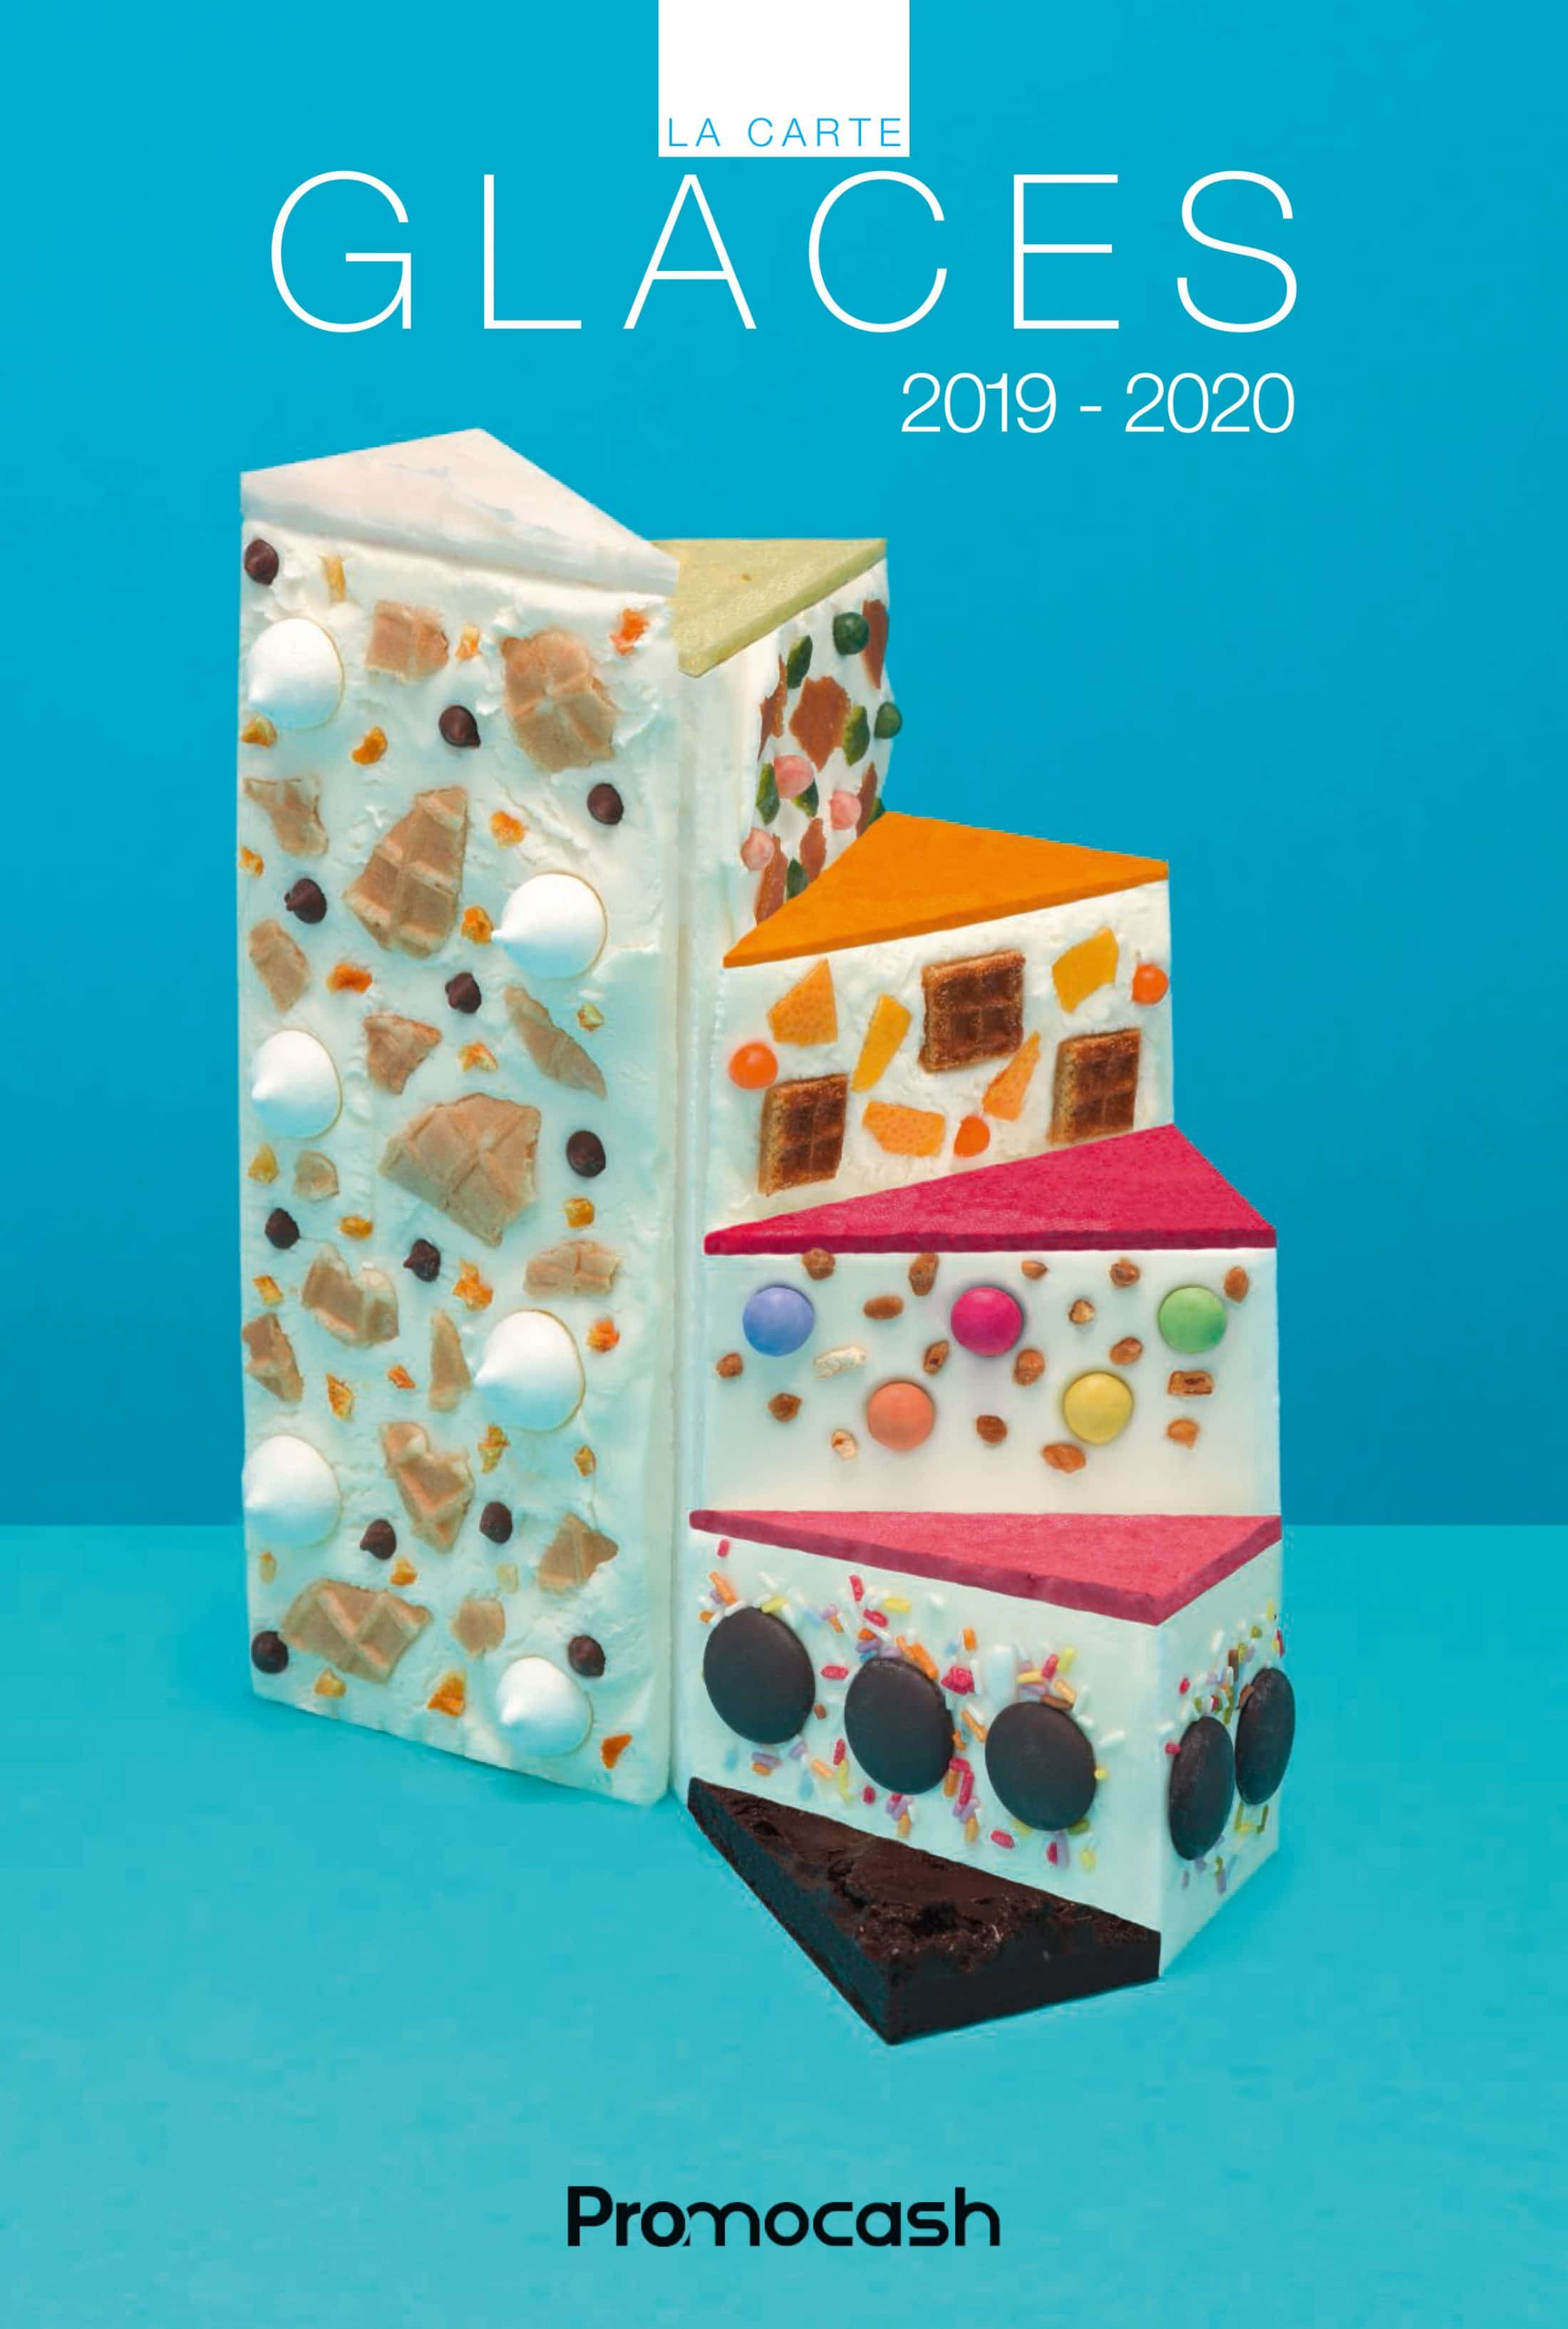 Carte glaces 2019-2020